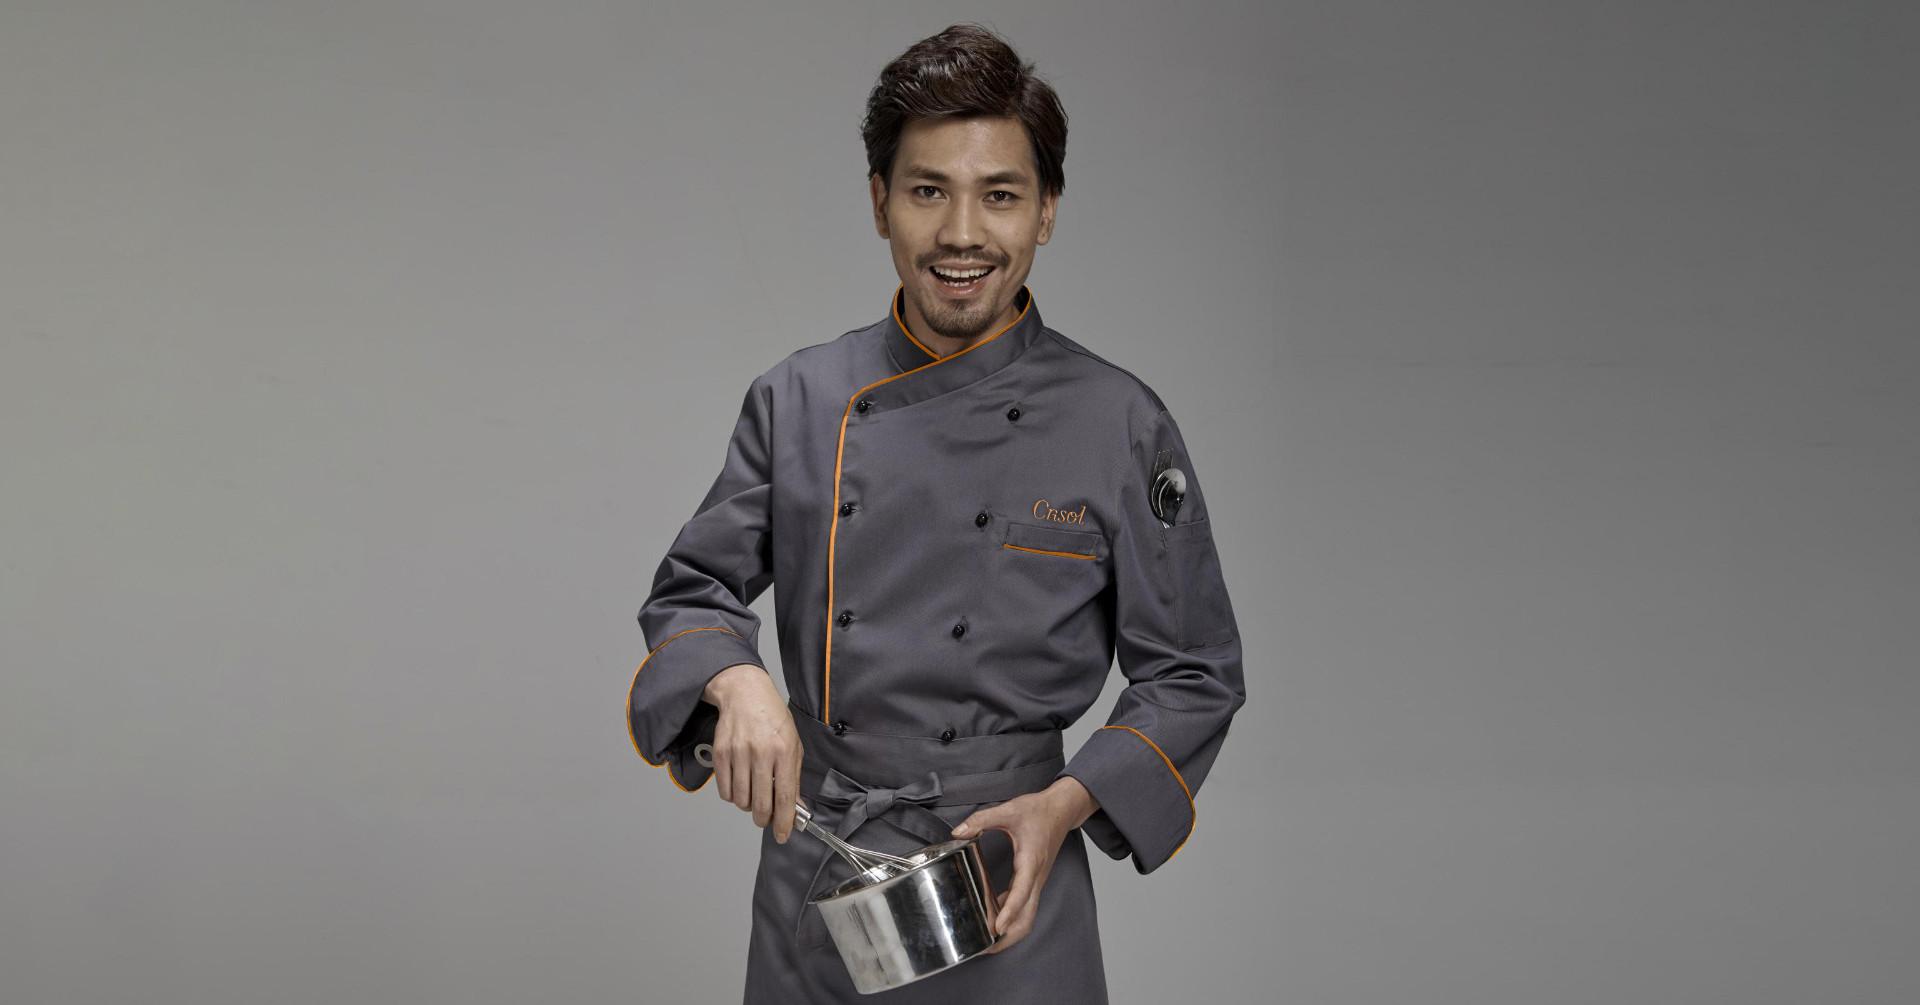 Crisol_Chef_Uniform.jpg